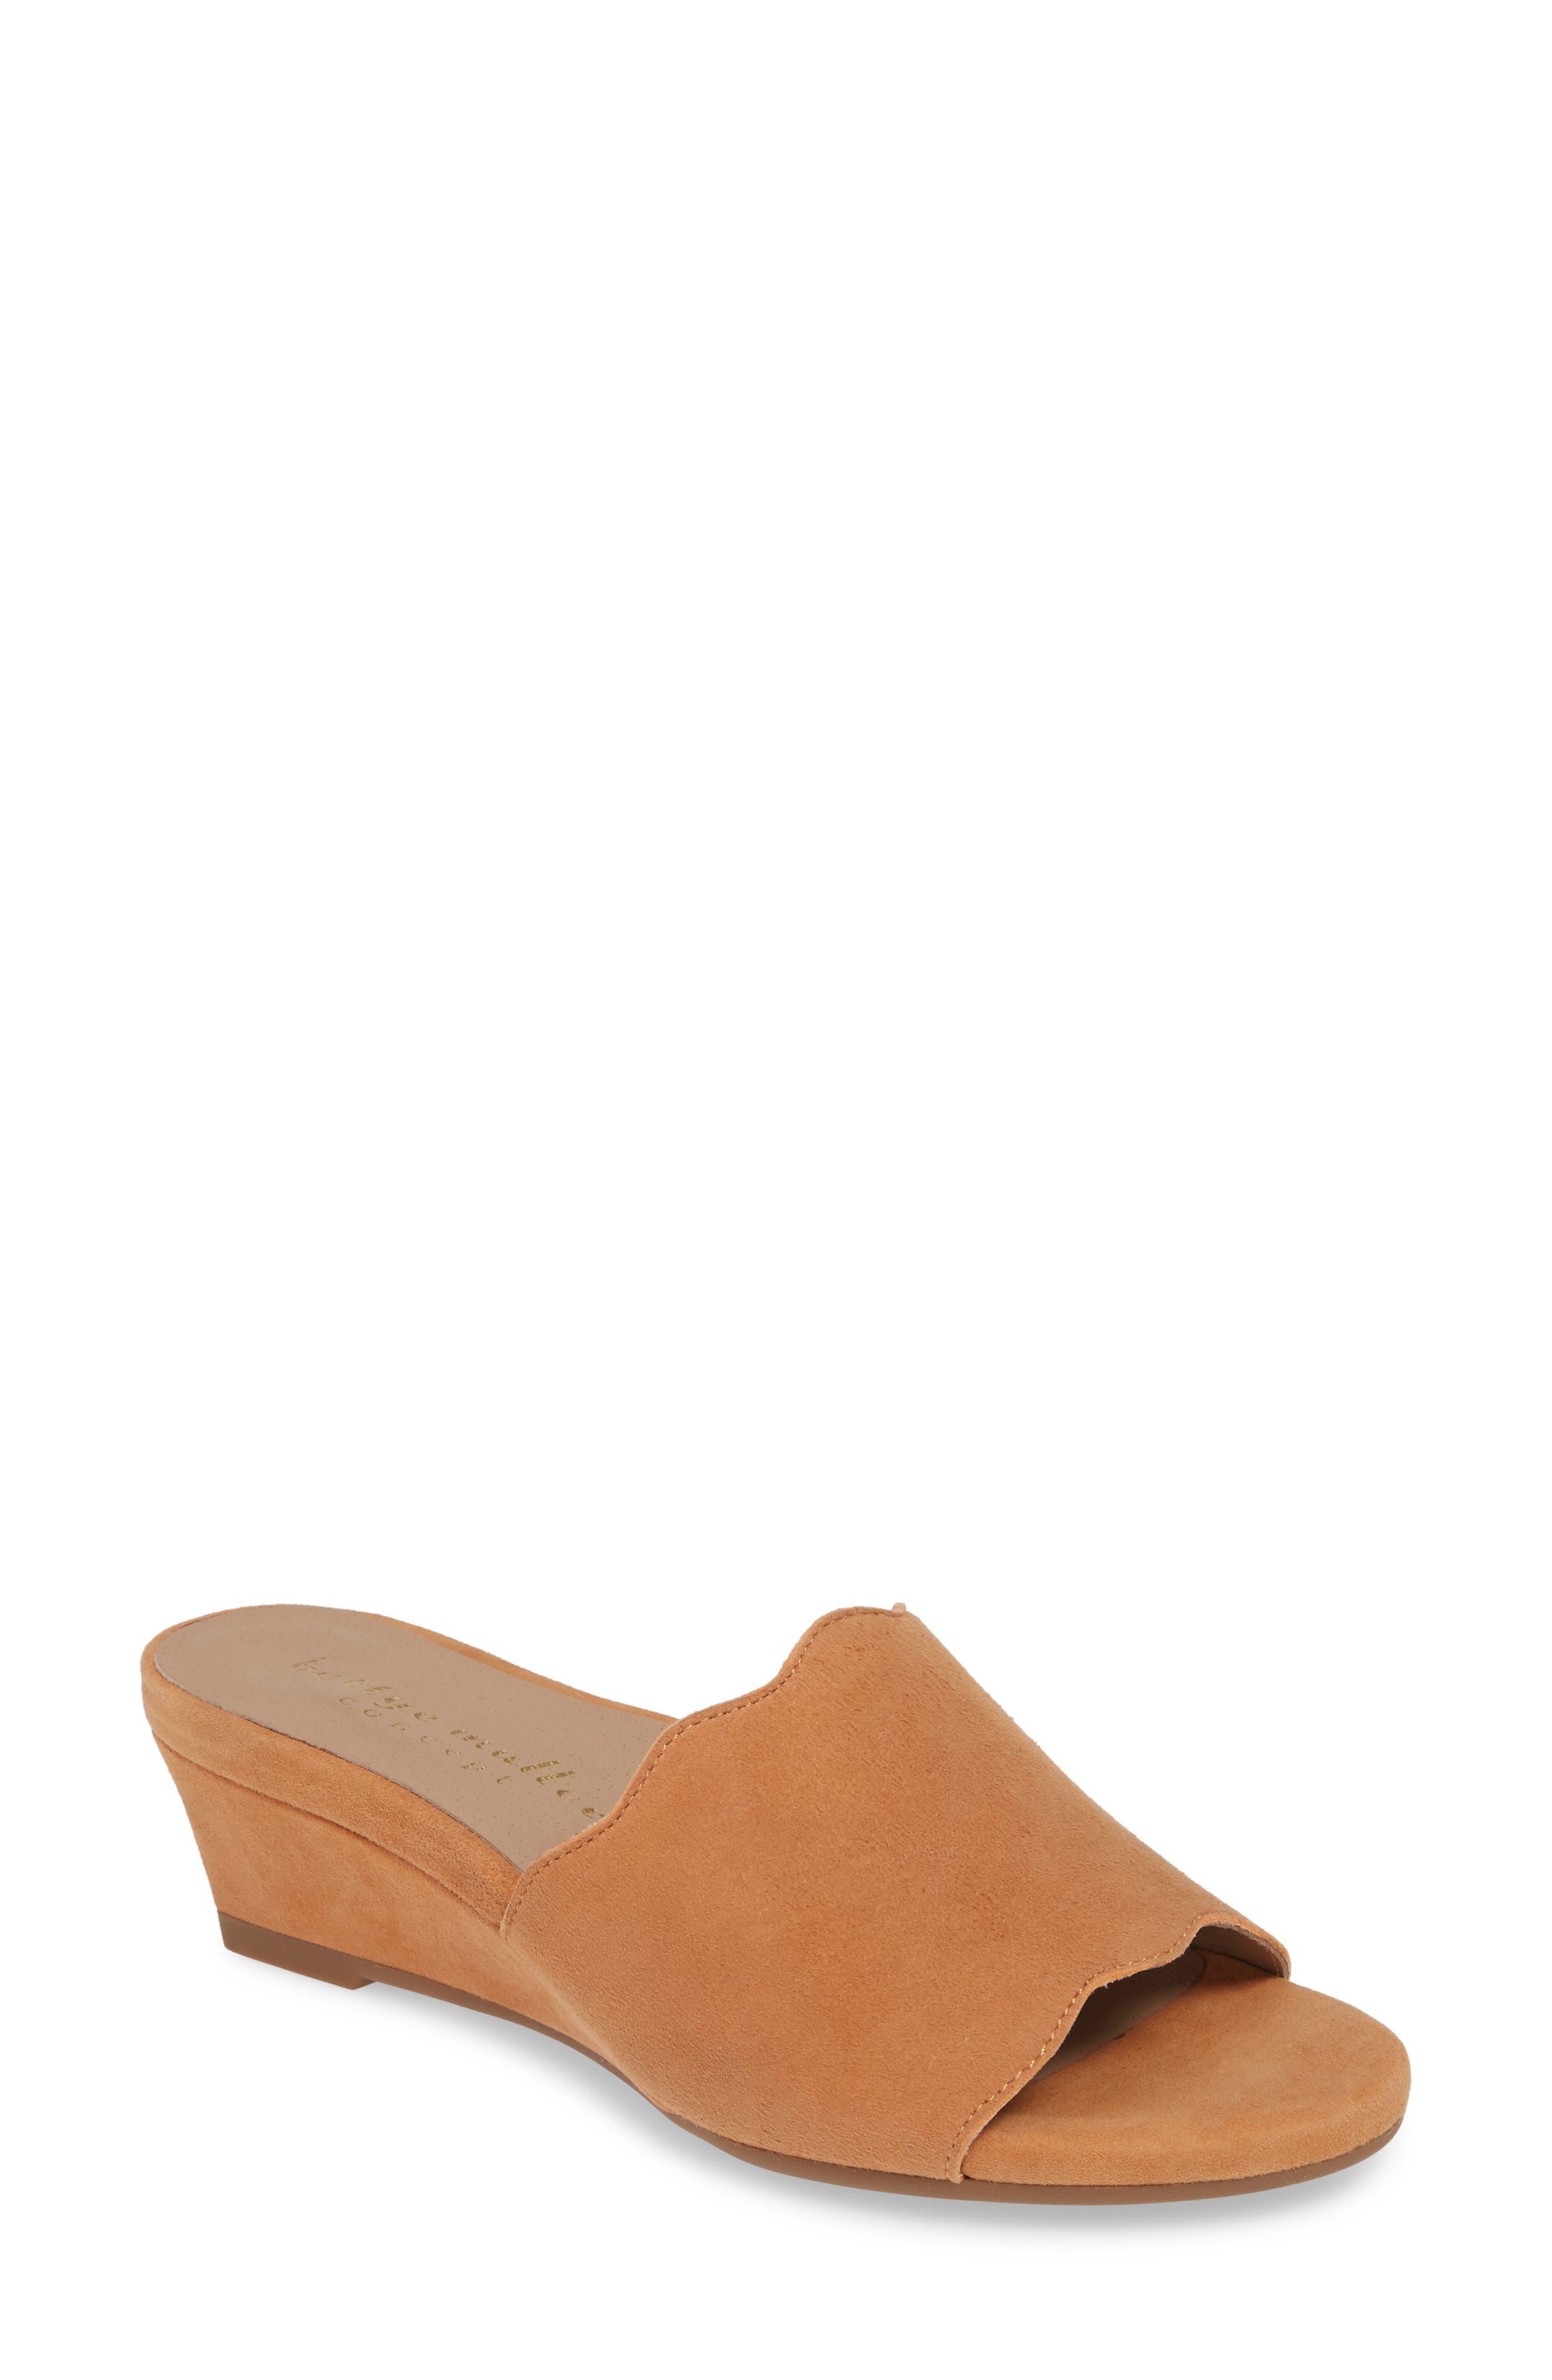 Bettye Muller Concepts Seema Slide Sandal, Orange